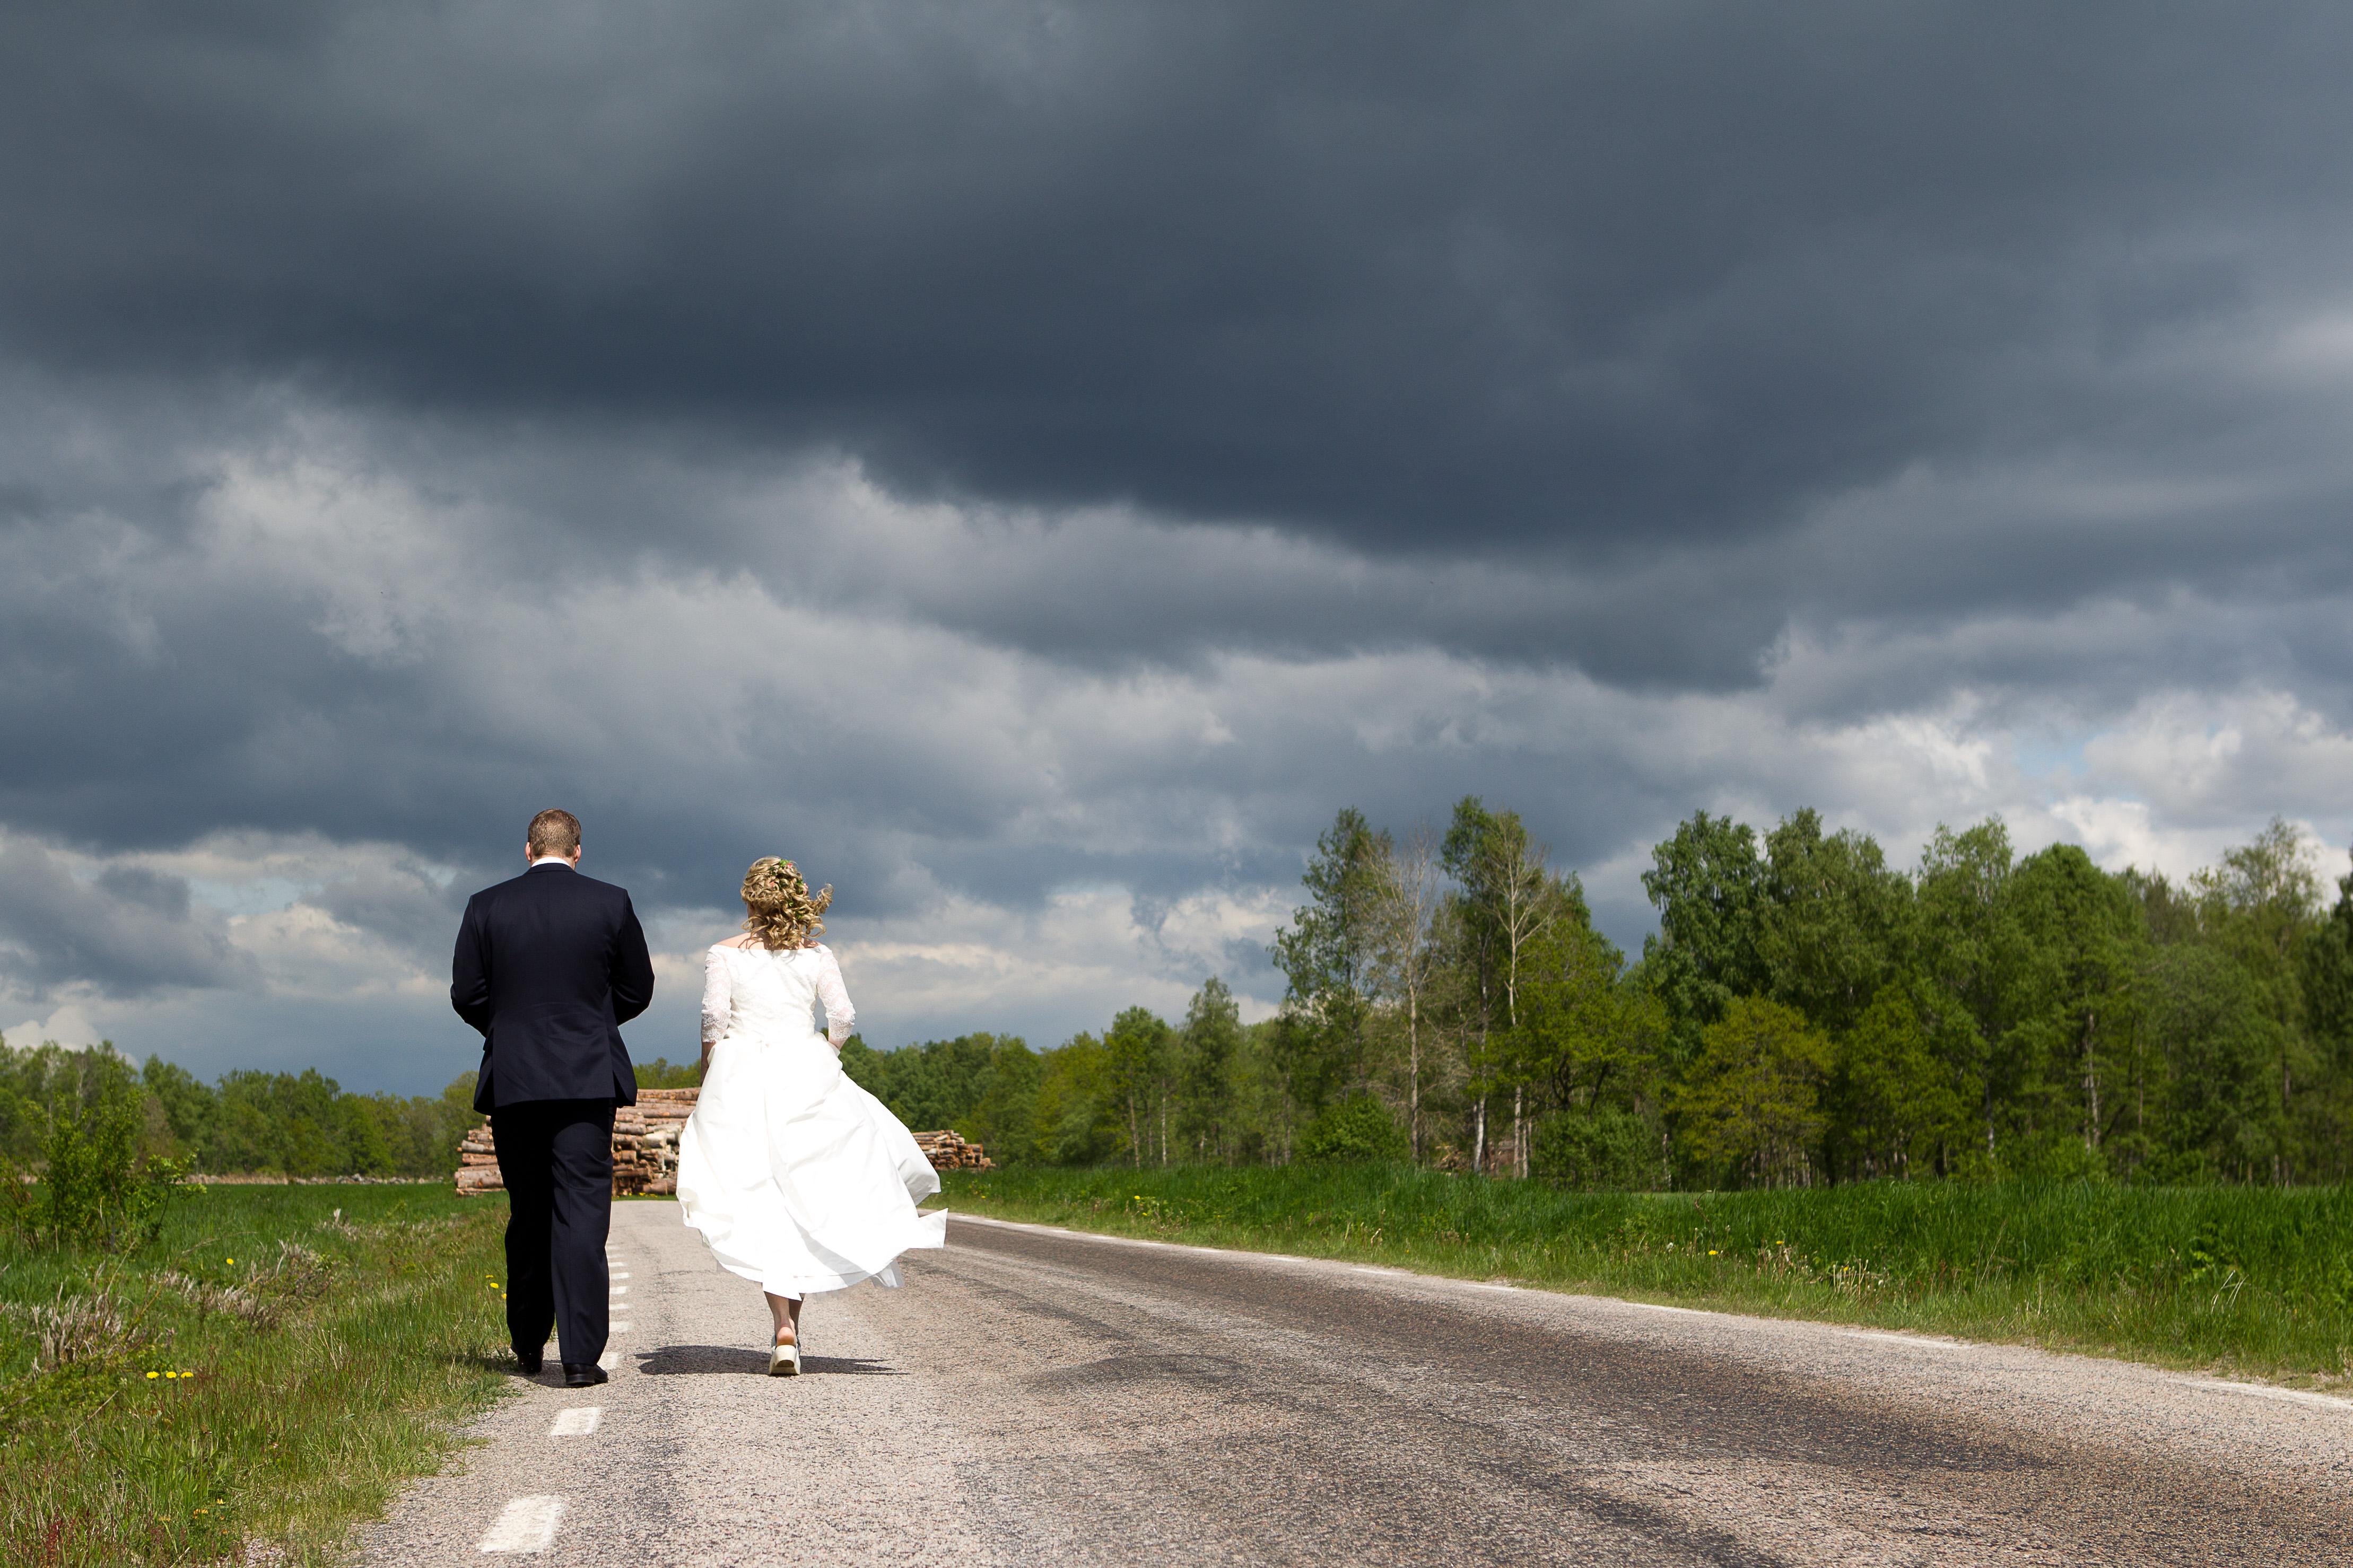 Bröllop Sämsjön Trollabo kvarn Ljung- photomalin.se